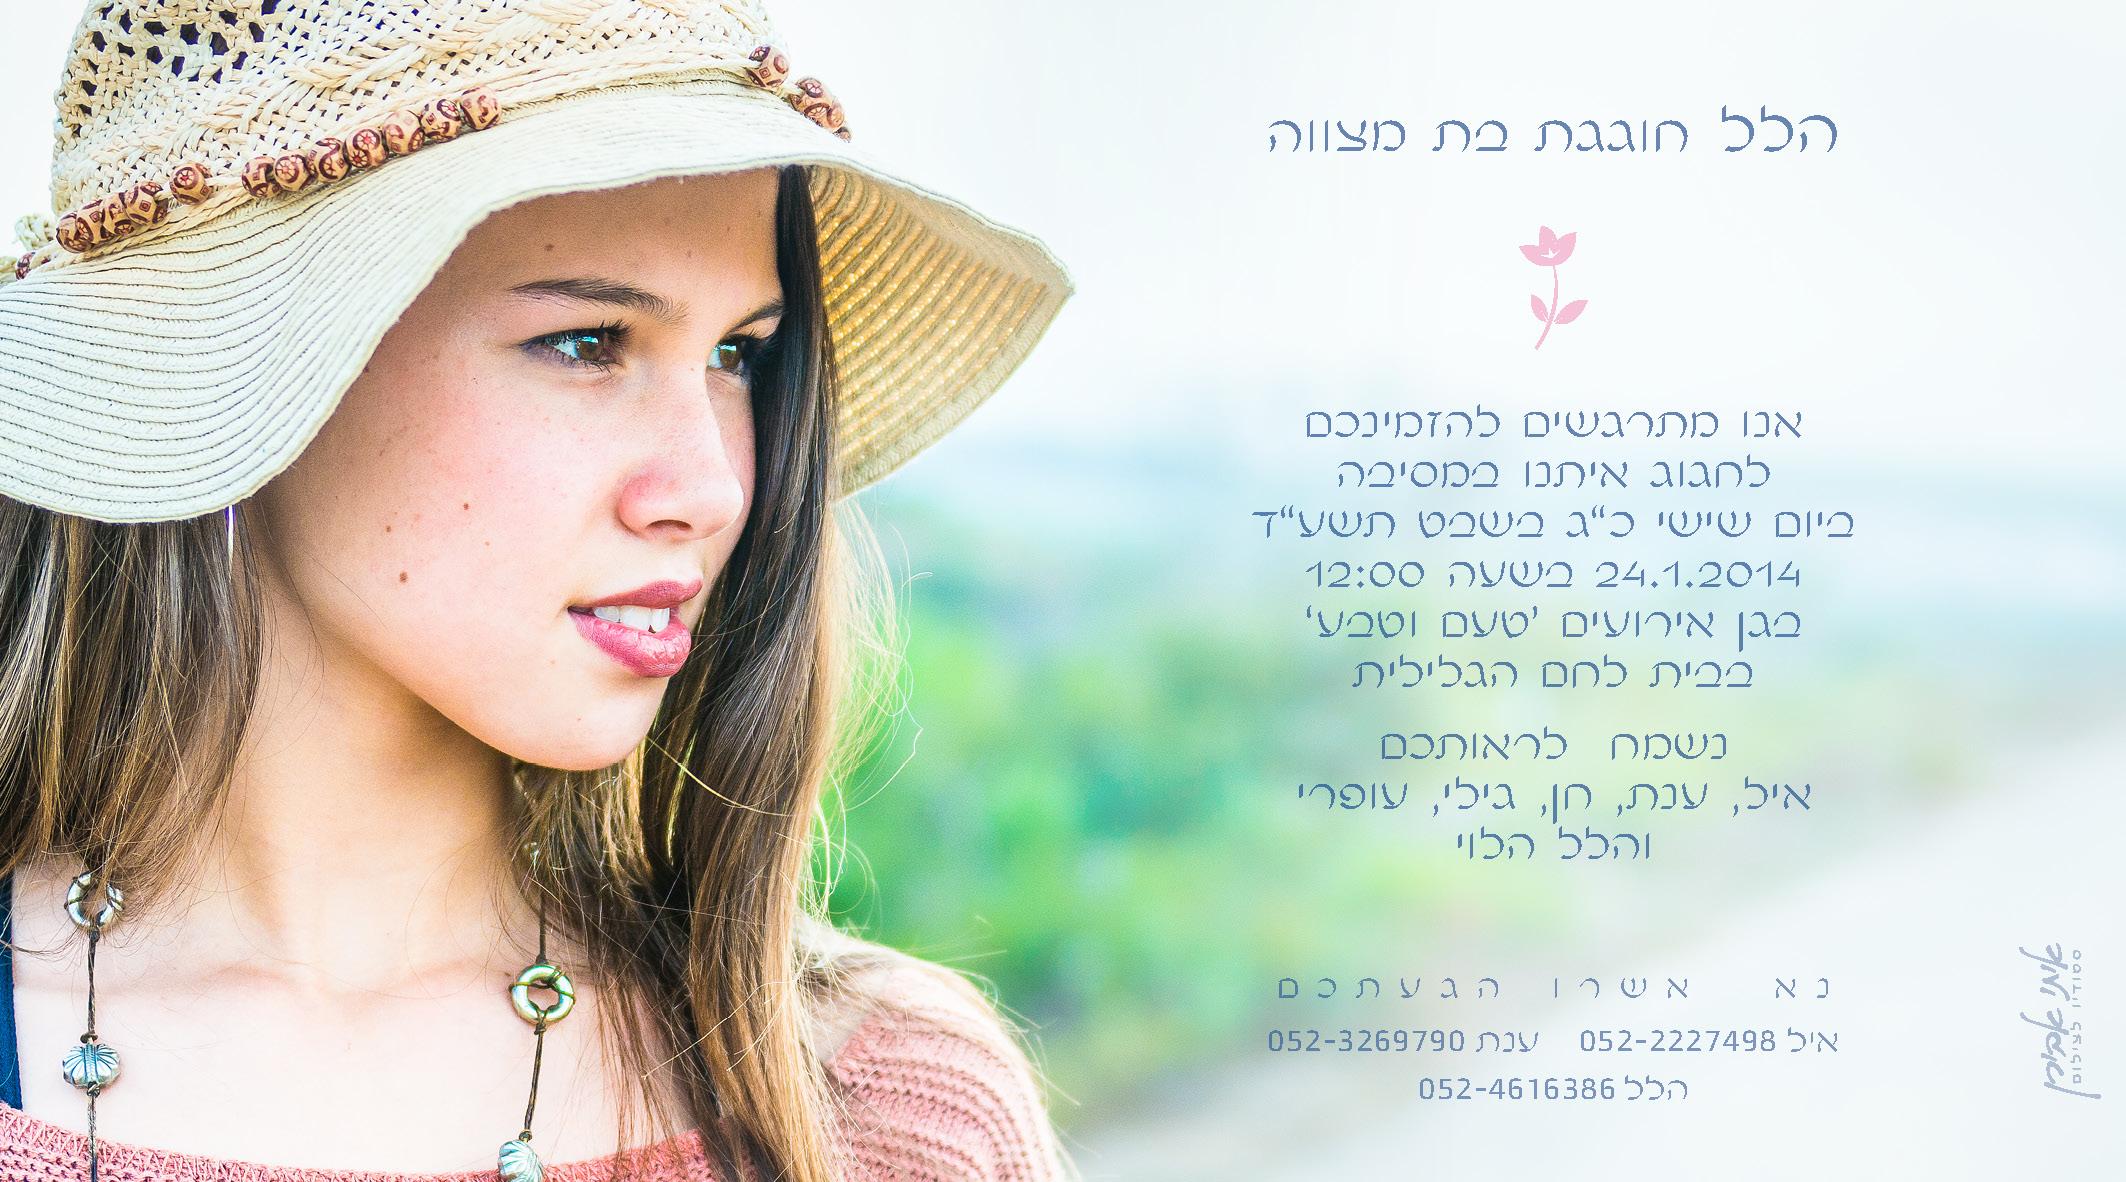 Halel Halevi Invitation 02 wide 10x18.jpg